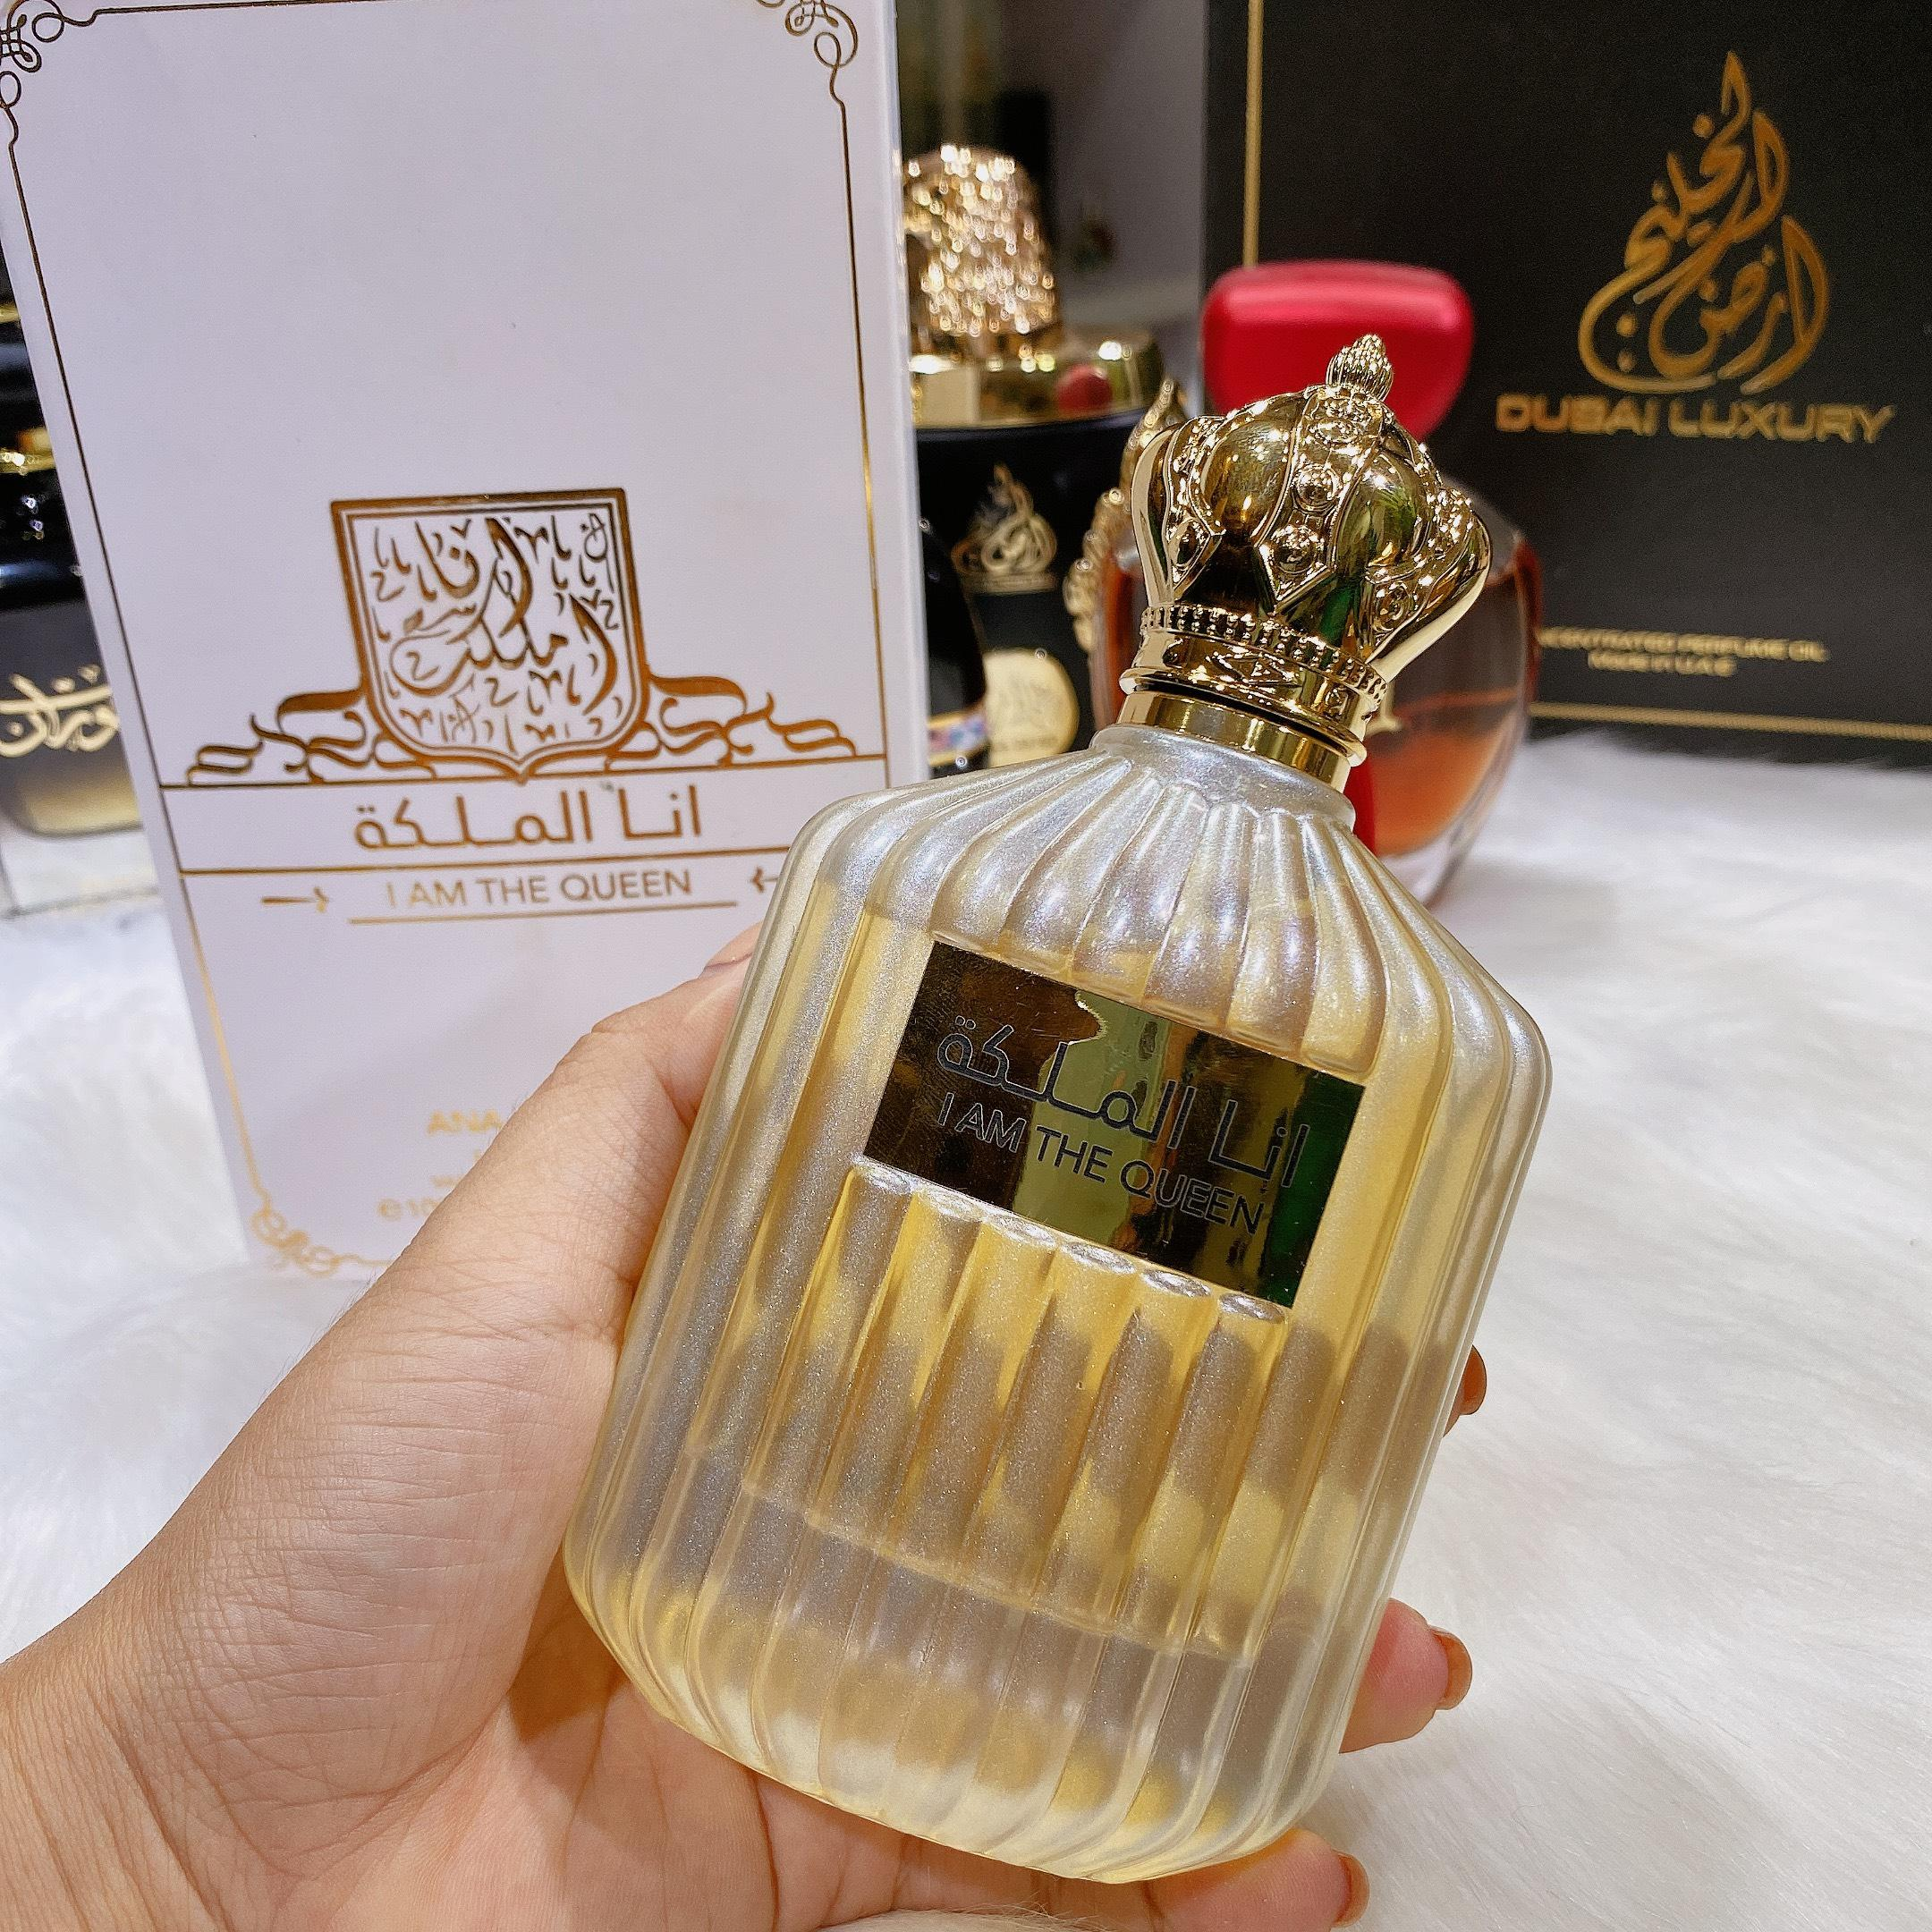 nuoc-hoa-dubai-nu-i-am-the-queen-100ml-quy-phai